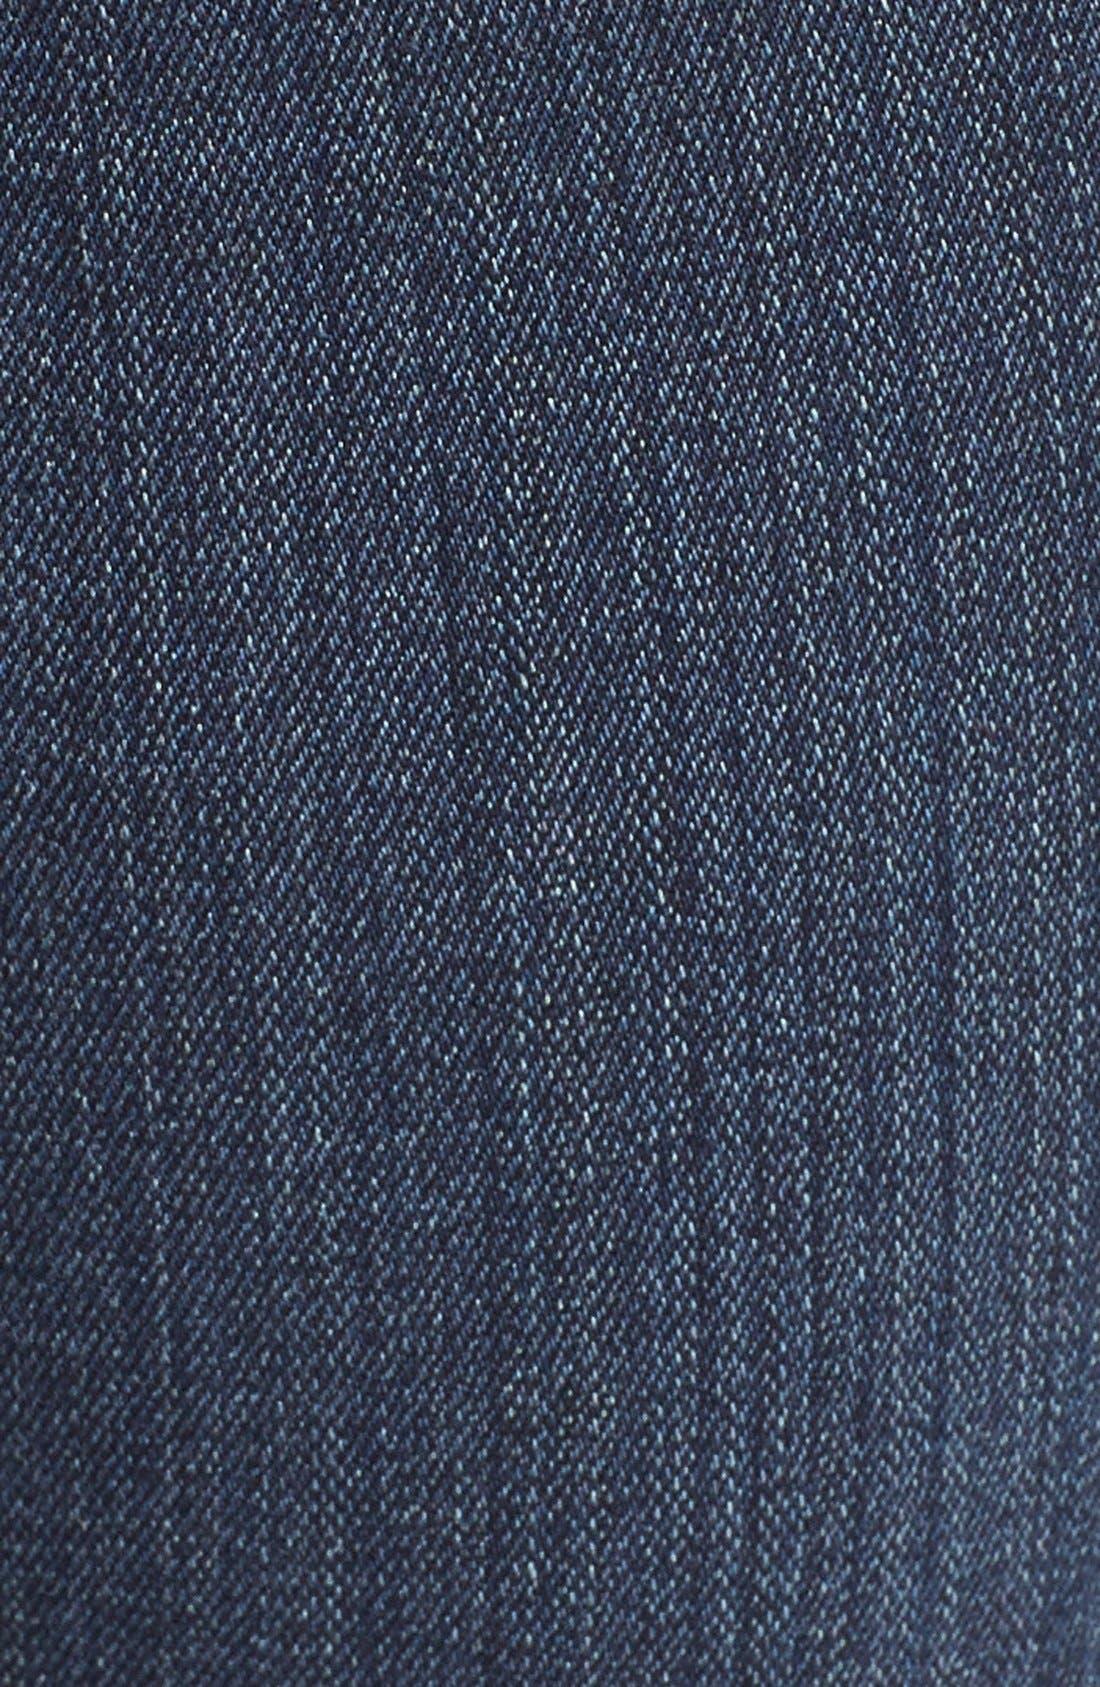 Alternate Image 5  - Paige Denim 'Transcend - Skyline' Bootcut Jeans (Vista)